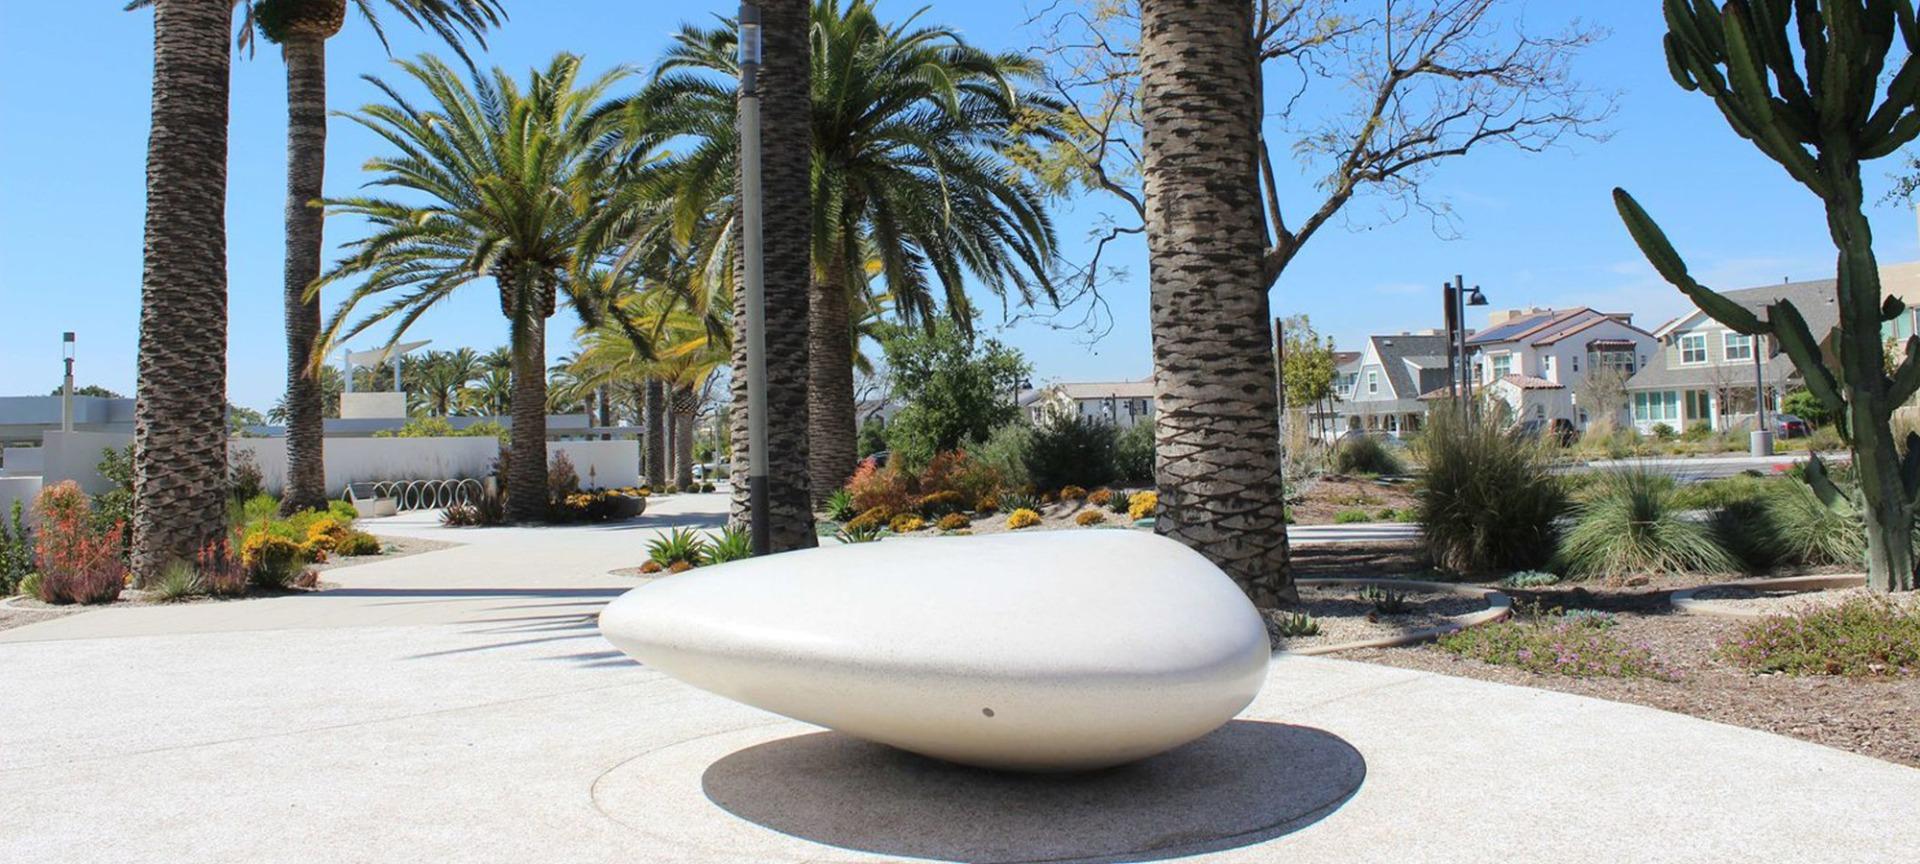 The Pools Park, Irvine